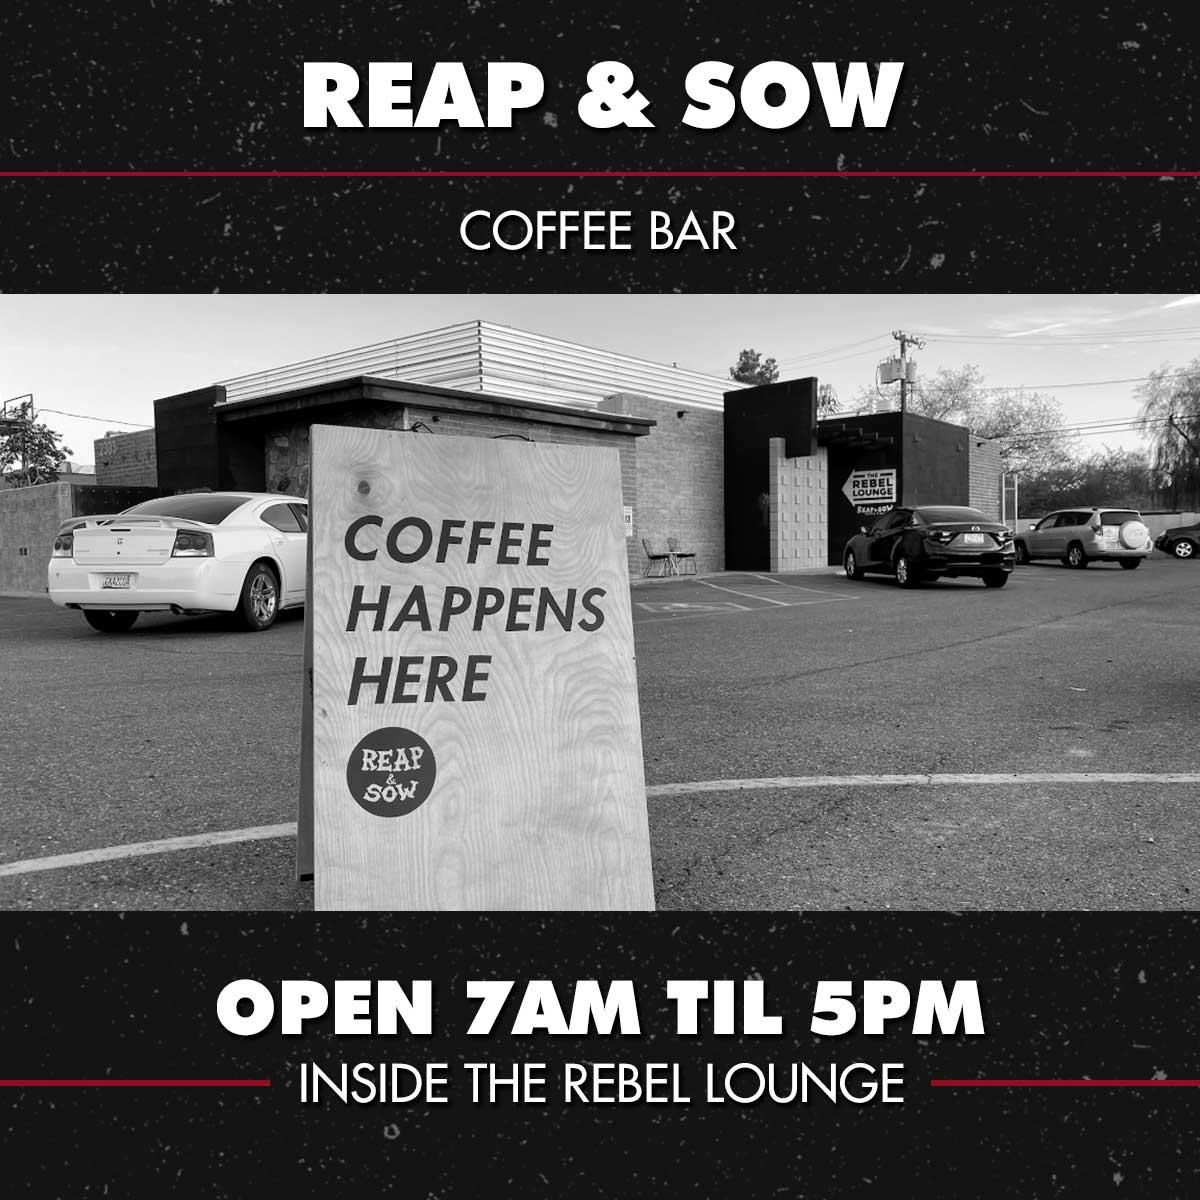 REAP & SOW: